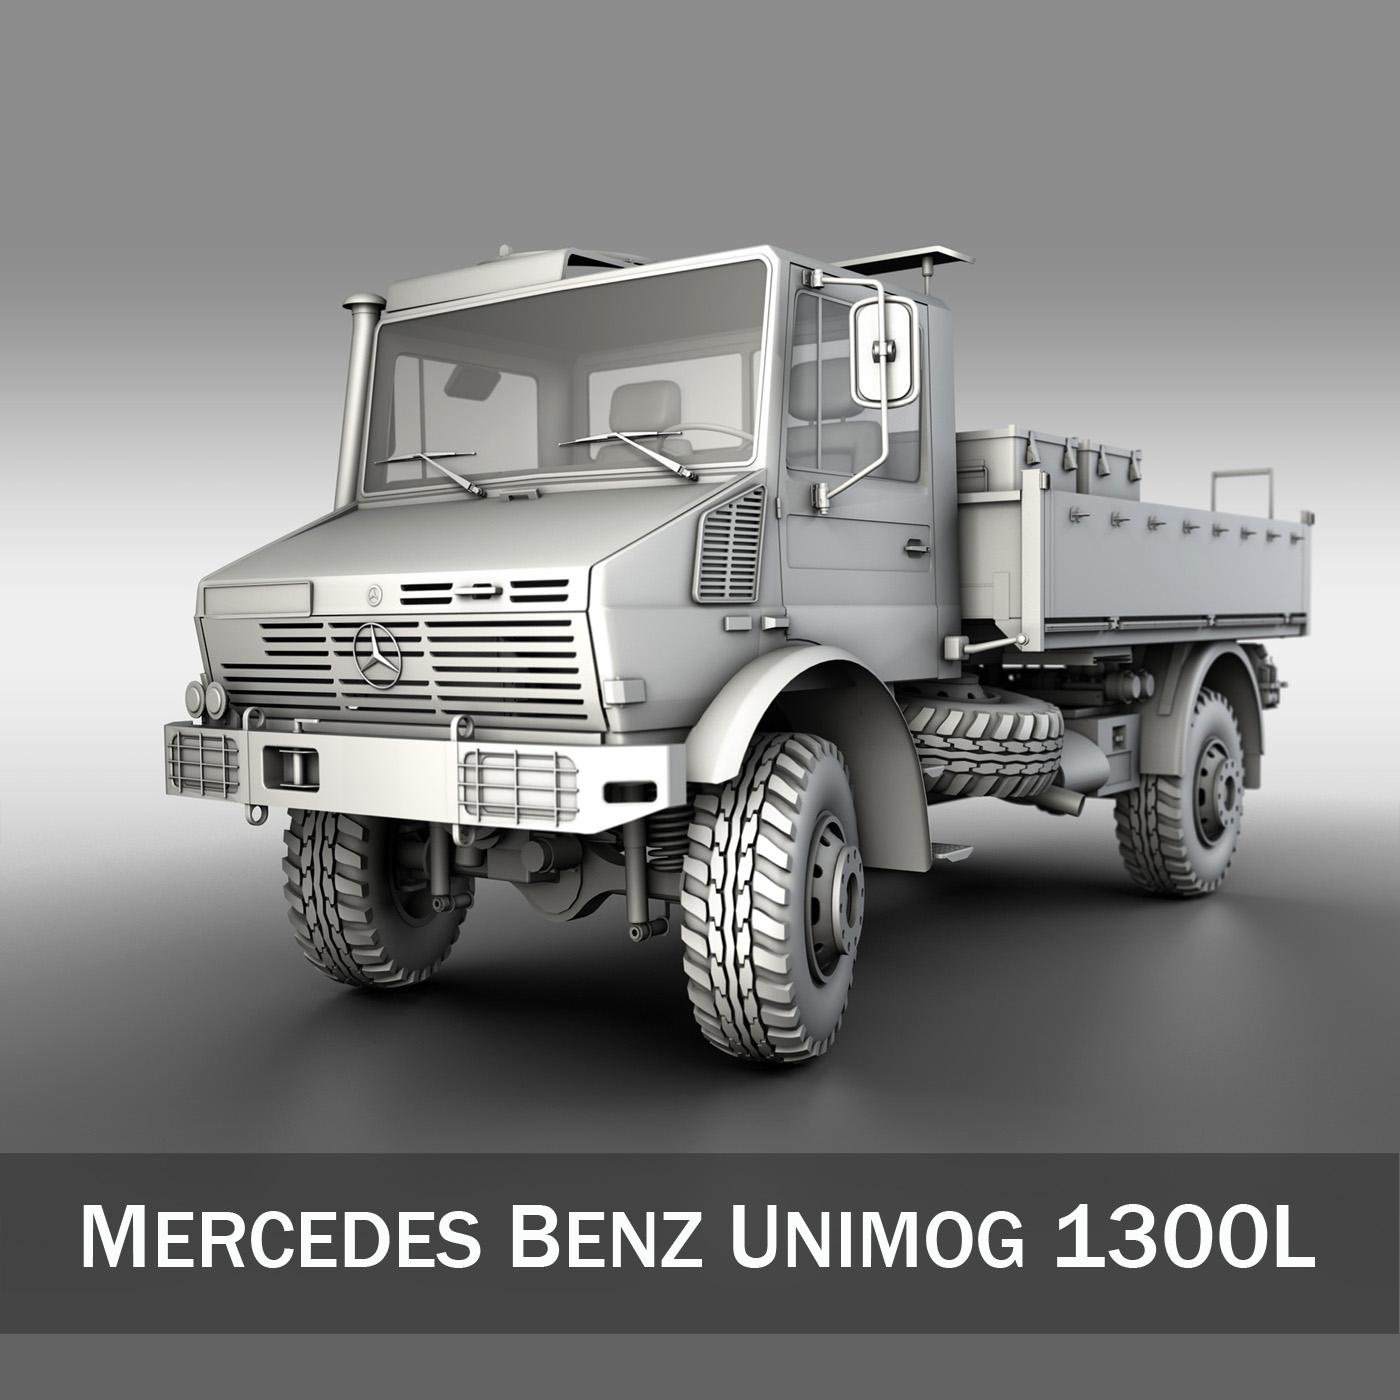 Mercedes Benz Unimog U1300L 3D Model – Buy Mercedes Benz Unimog